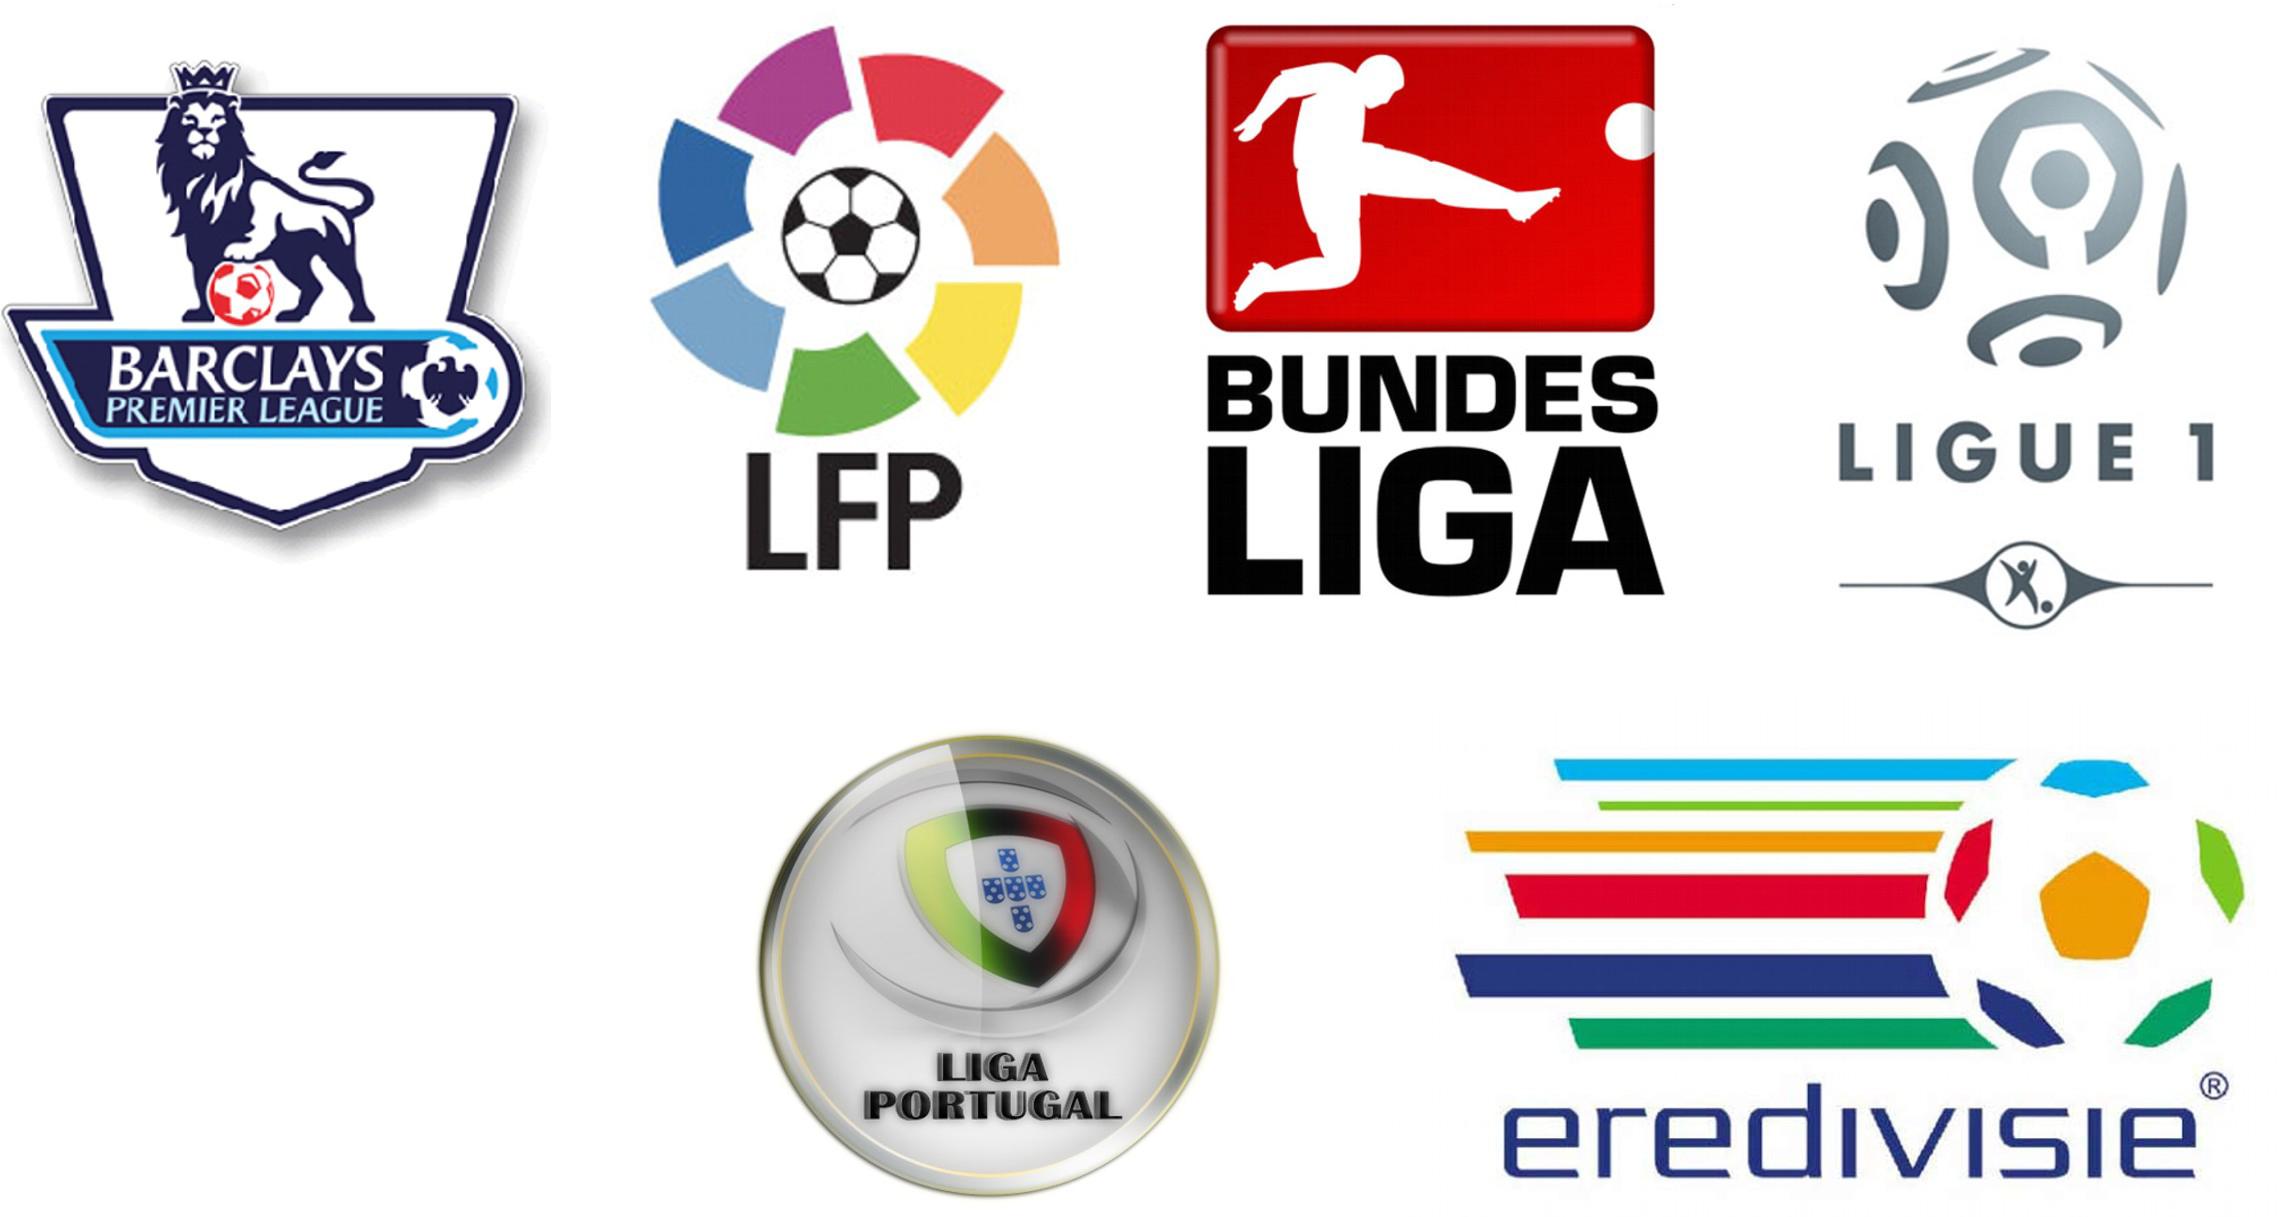 Futbol europeo.jpg